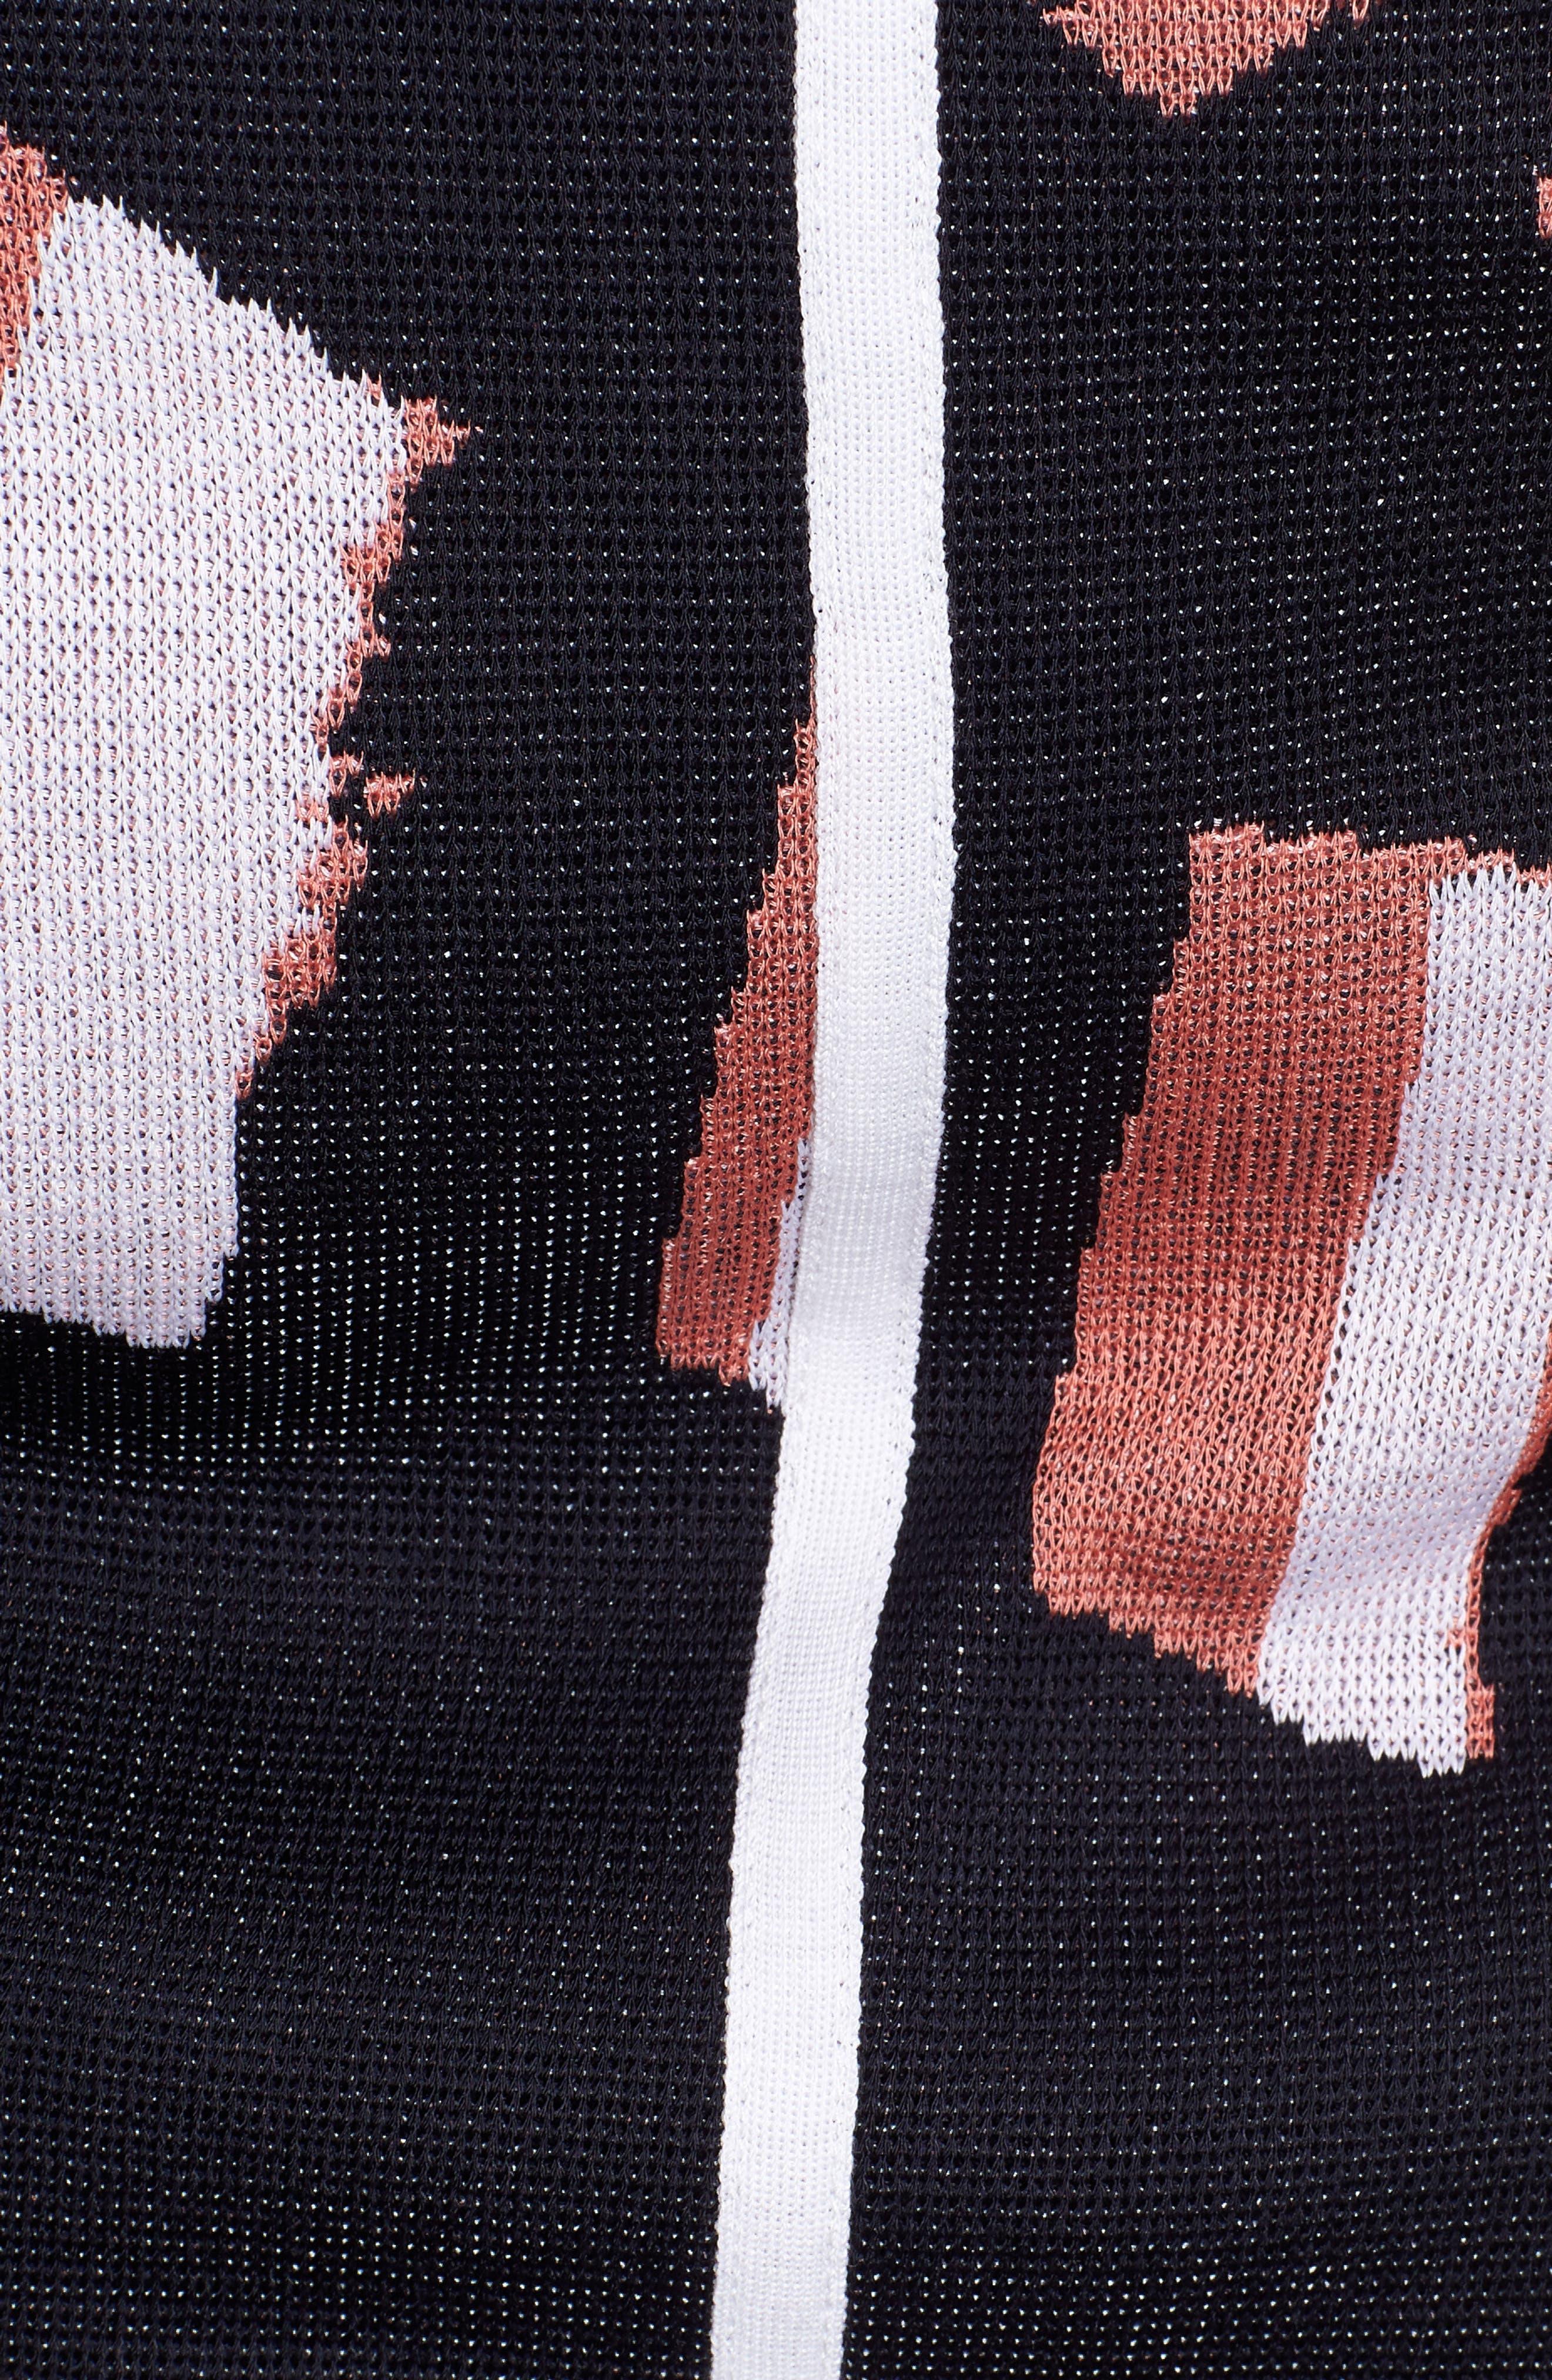 Zip Front Knit Jacket,                             Alternate thumbnail 5, color,                             Navy/ Daylily/ White